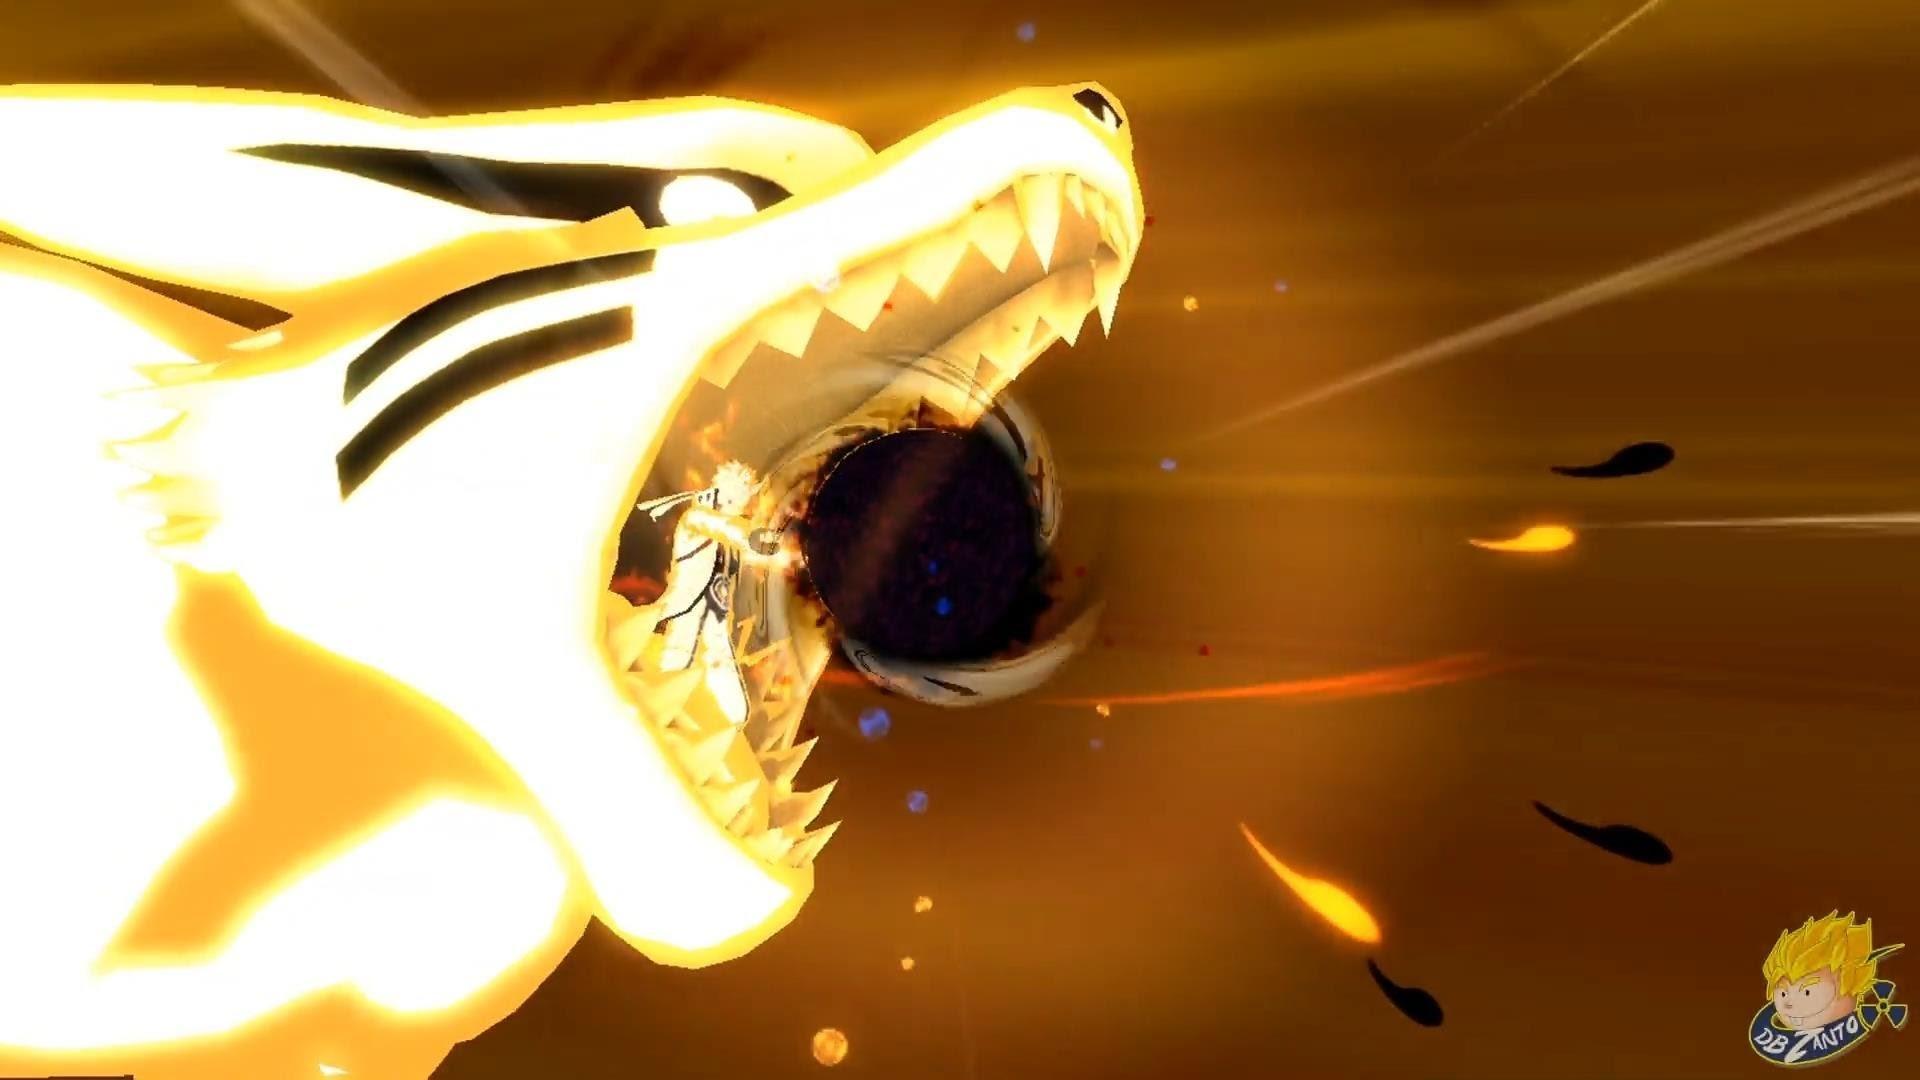 J-Stars Victory Vs : Naruto Uzumaki & Goku Vs Sasuke Uchiha & Vegeta【FULL HD  1080P】 – YouTube